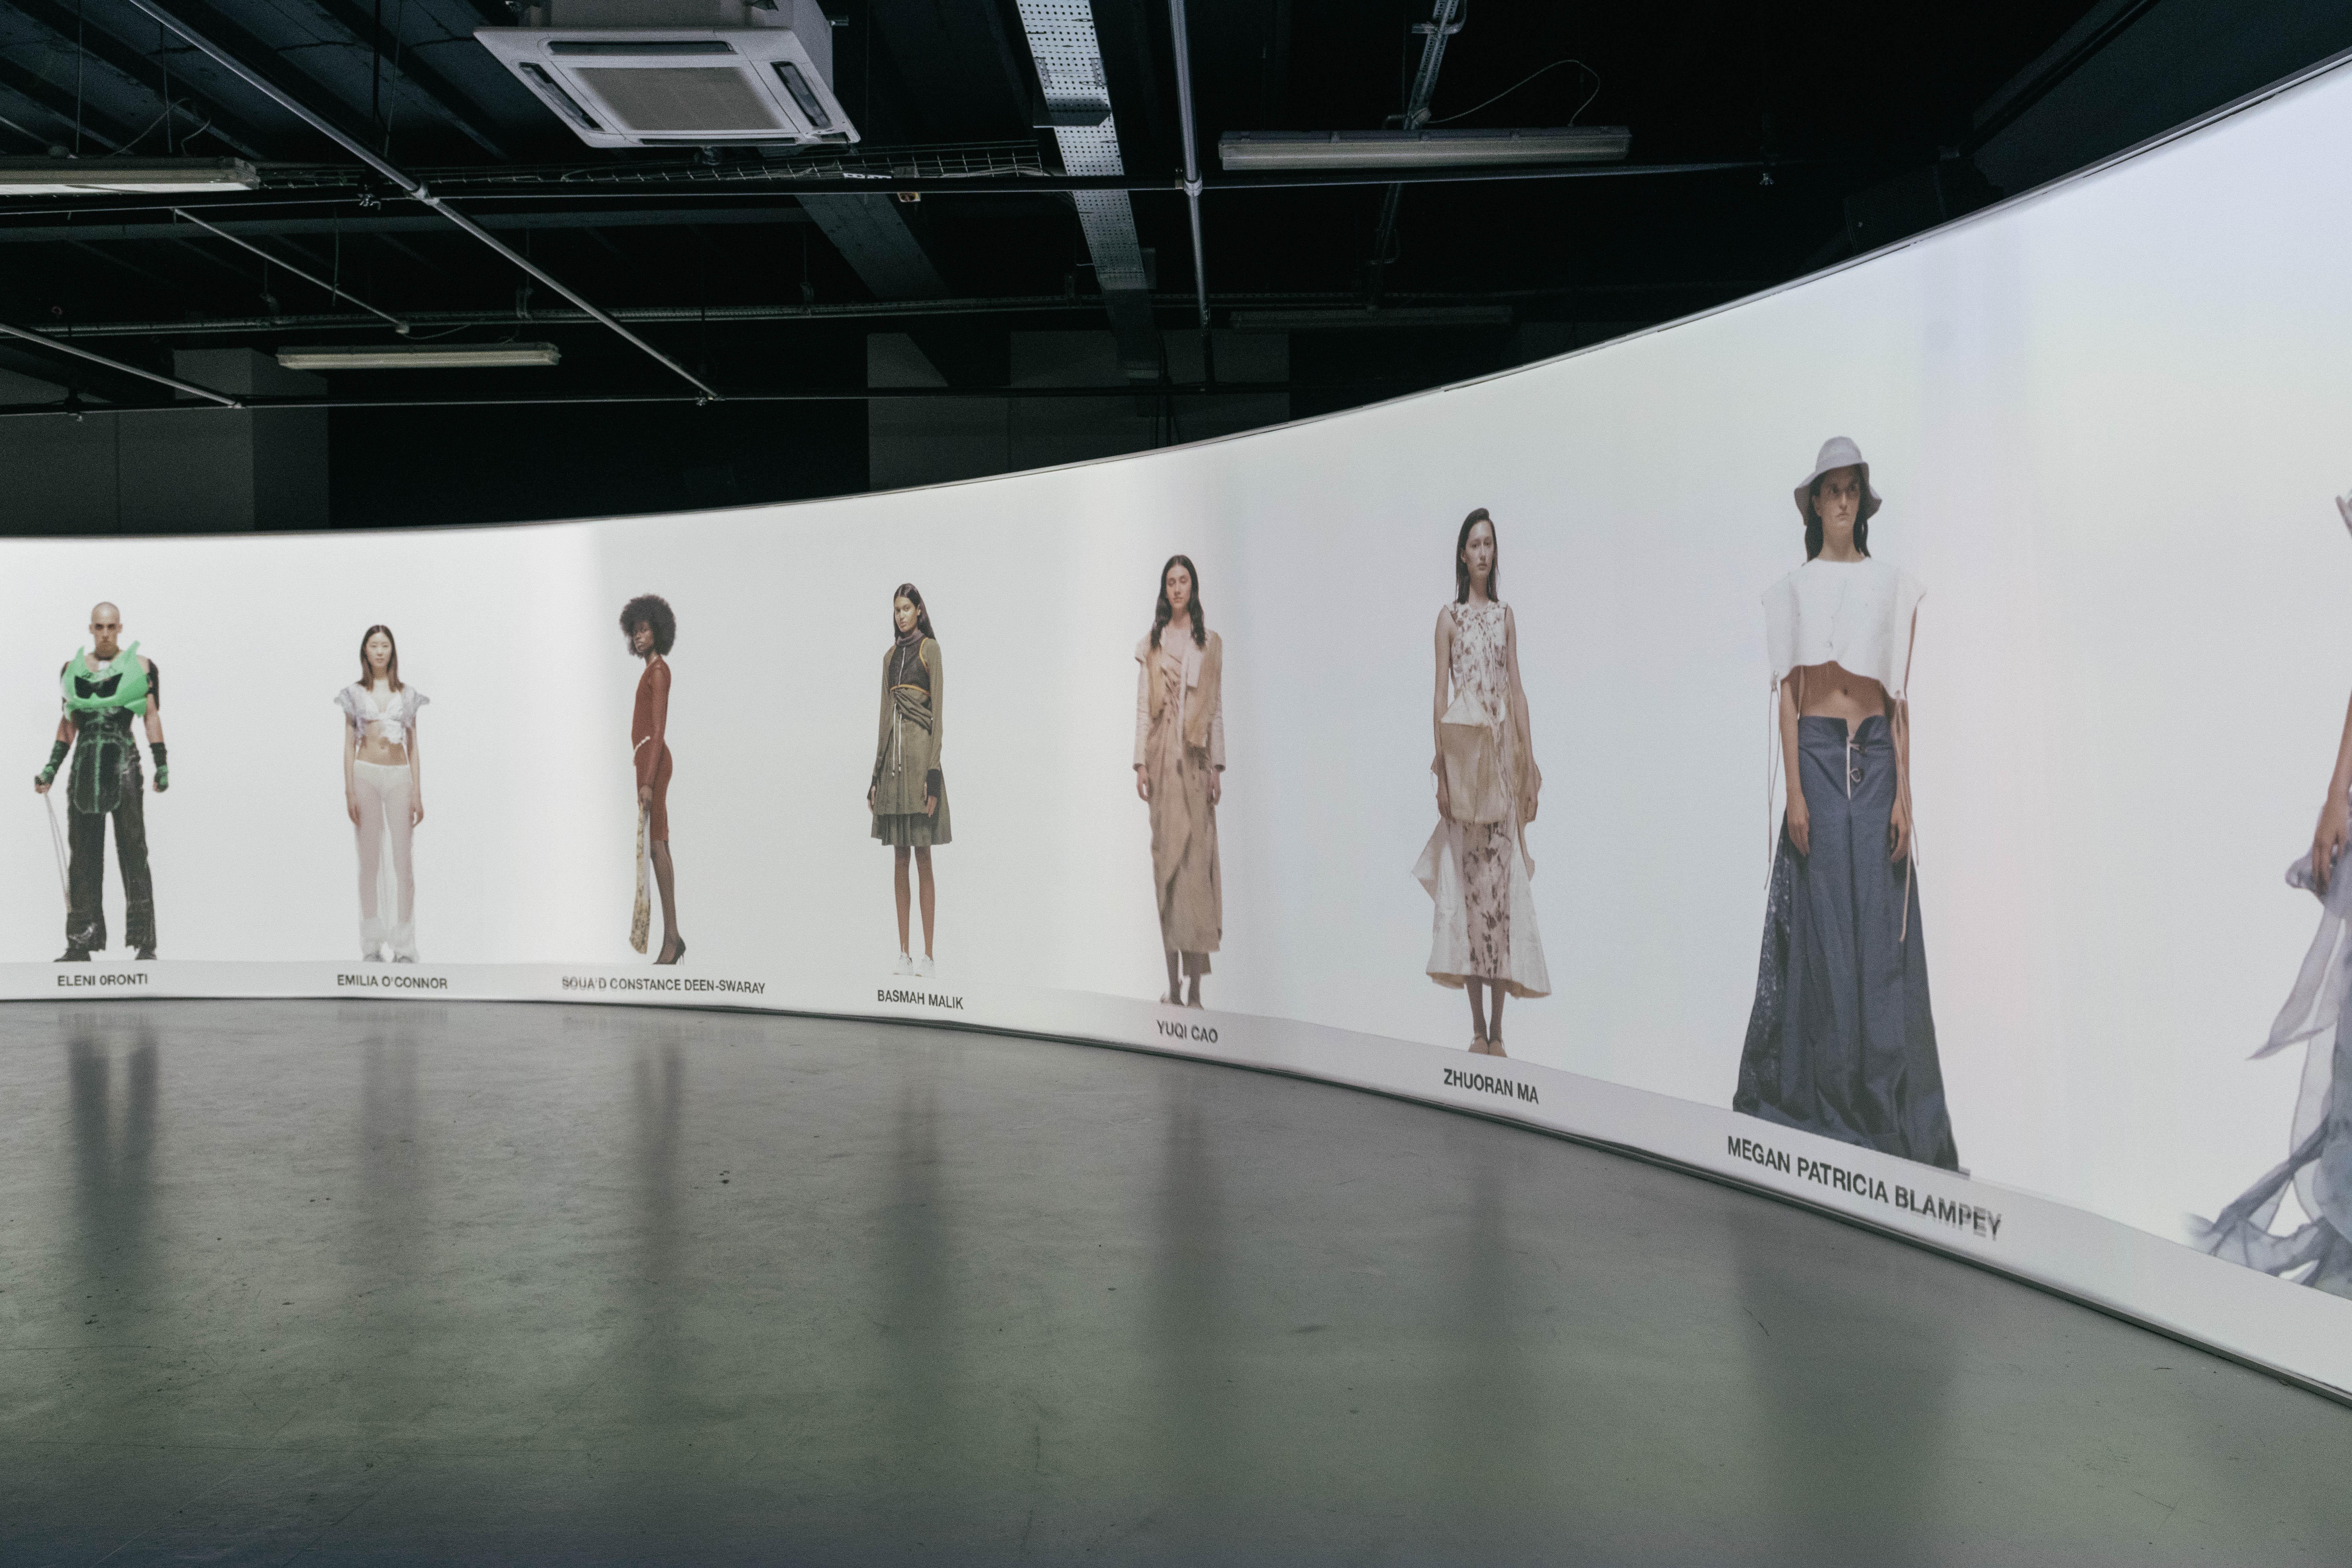 A fashion film featuring LCF BA fashion students' work at the graduate showcase